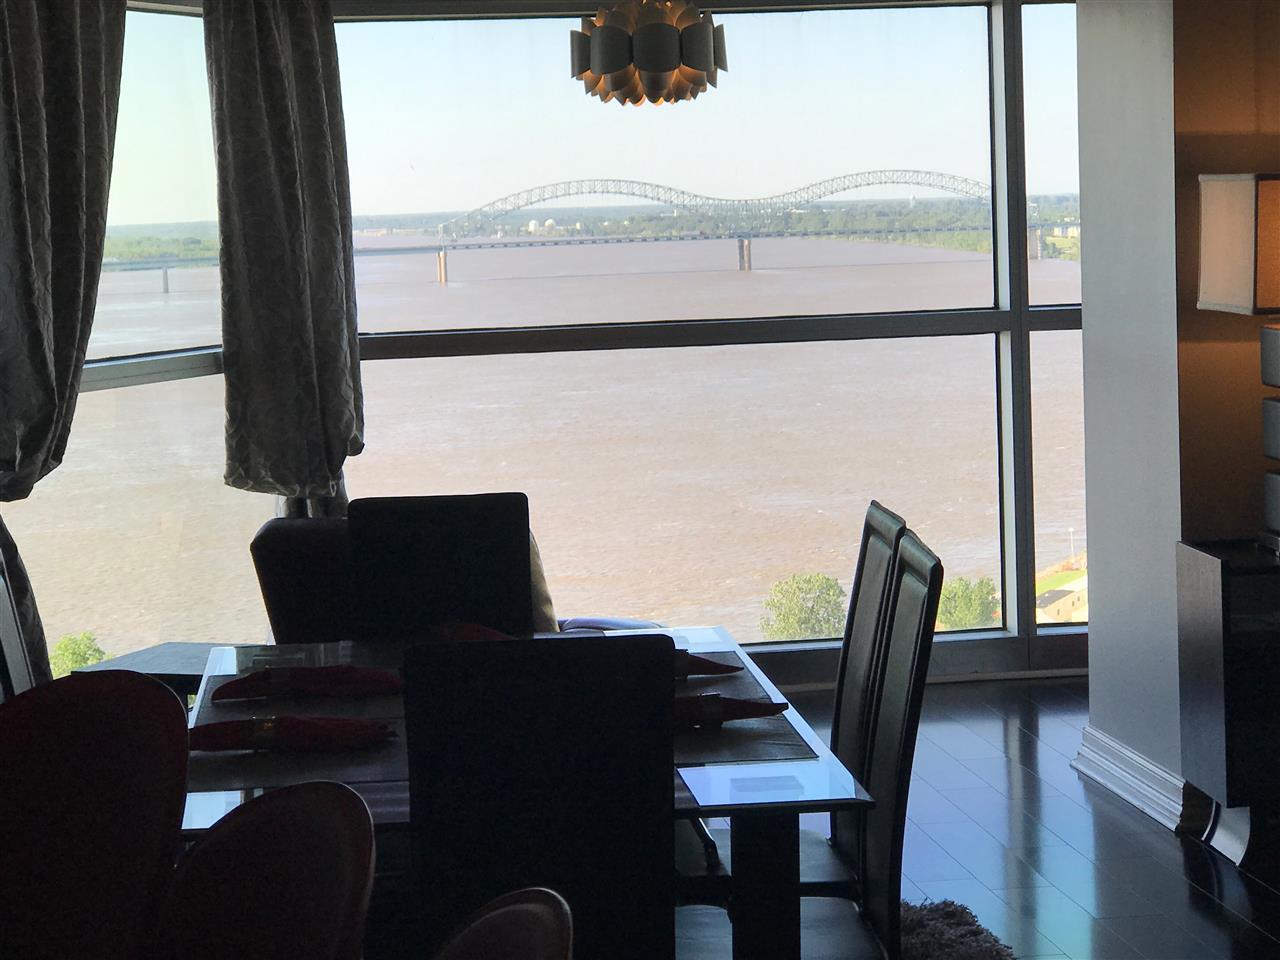 655 Riverside Memphis, TN 38103 - MLS #: 10002750